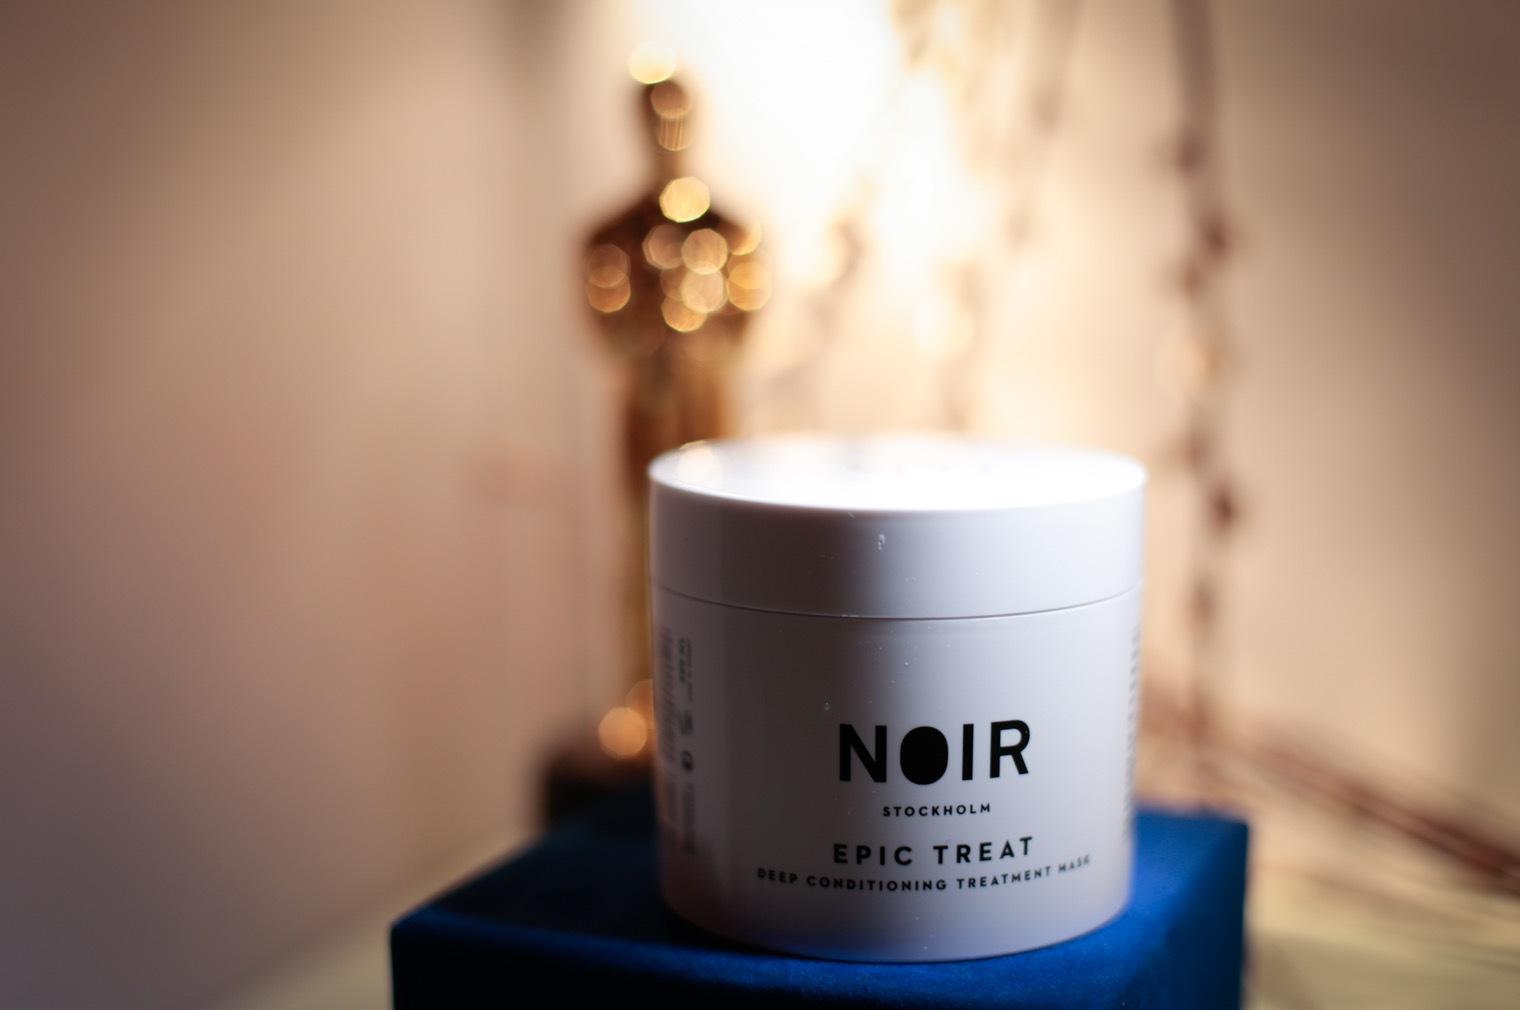 Noir Stockholm har gjort en strålande start under 2016 med flera bra produkter